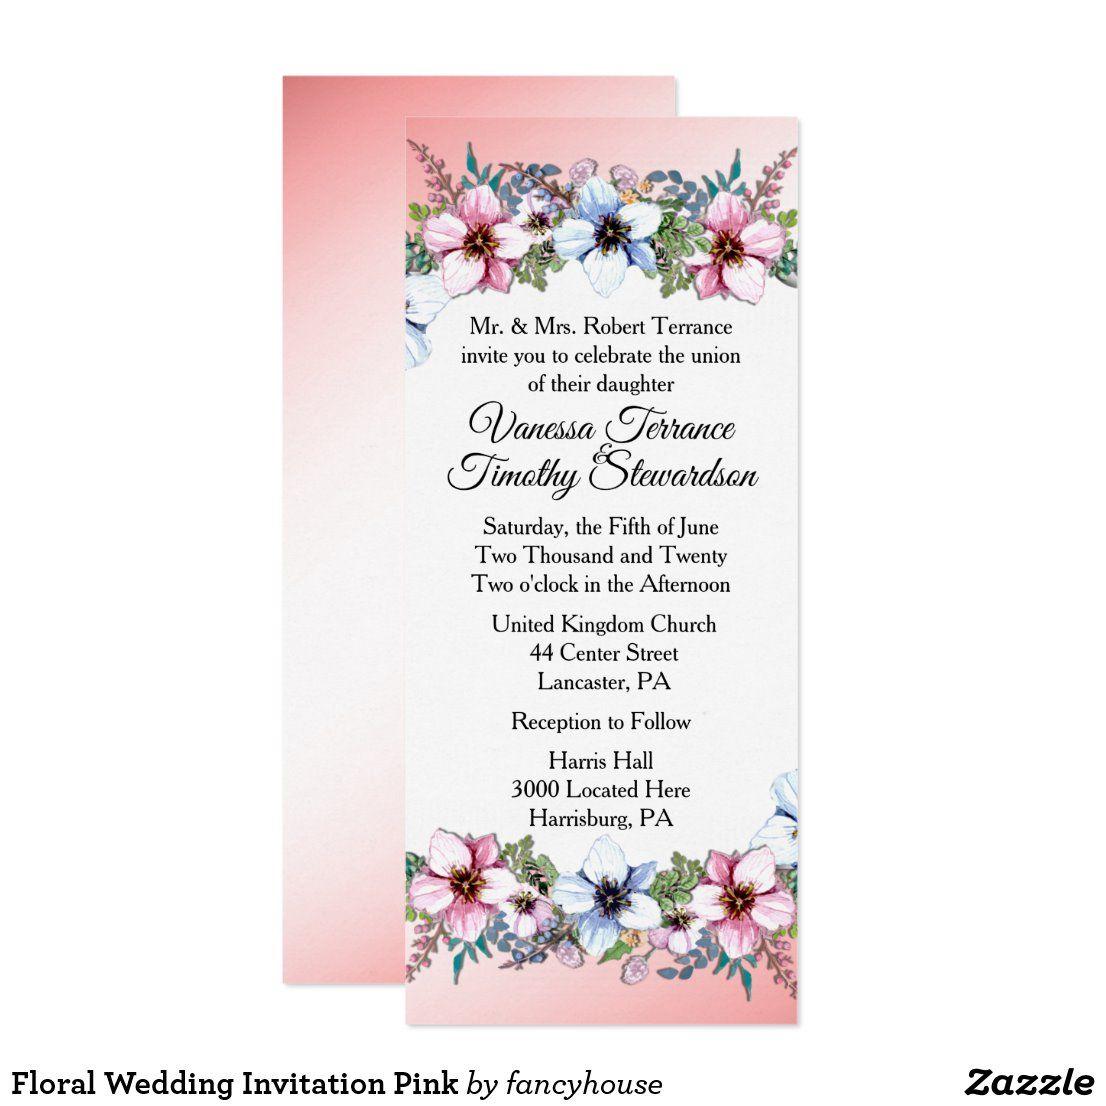 Floral Wedding Invitation Pink Zazzle Com In 2020 Pink Wedding Invitations Floral Wedding Invitations Wedding Invitations